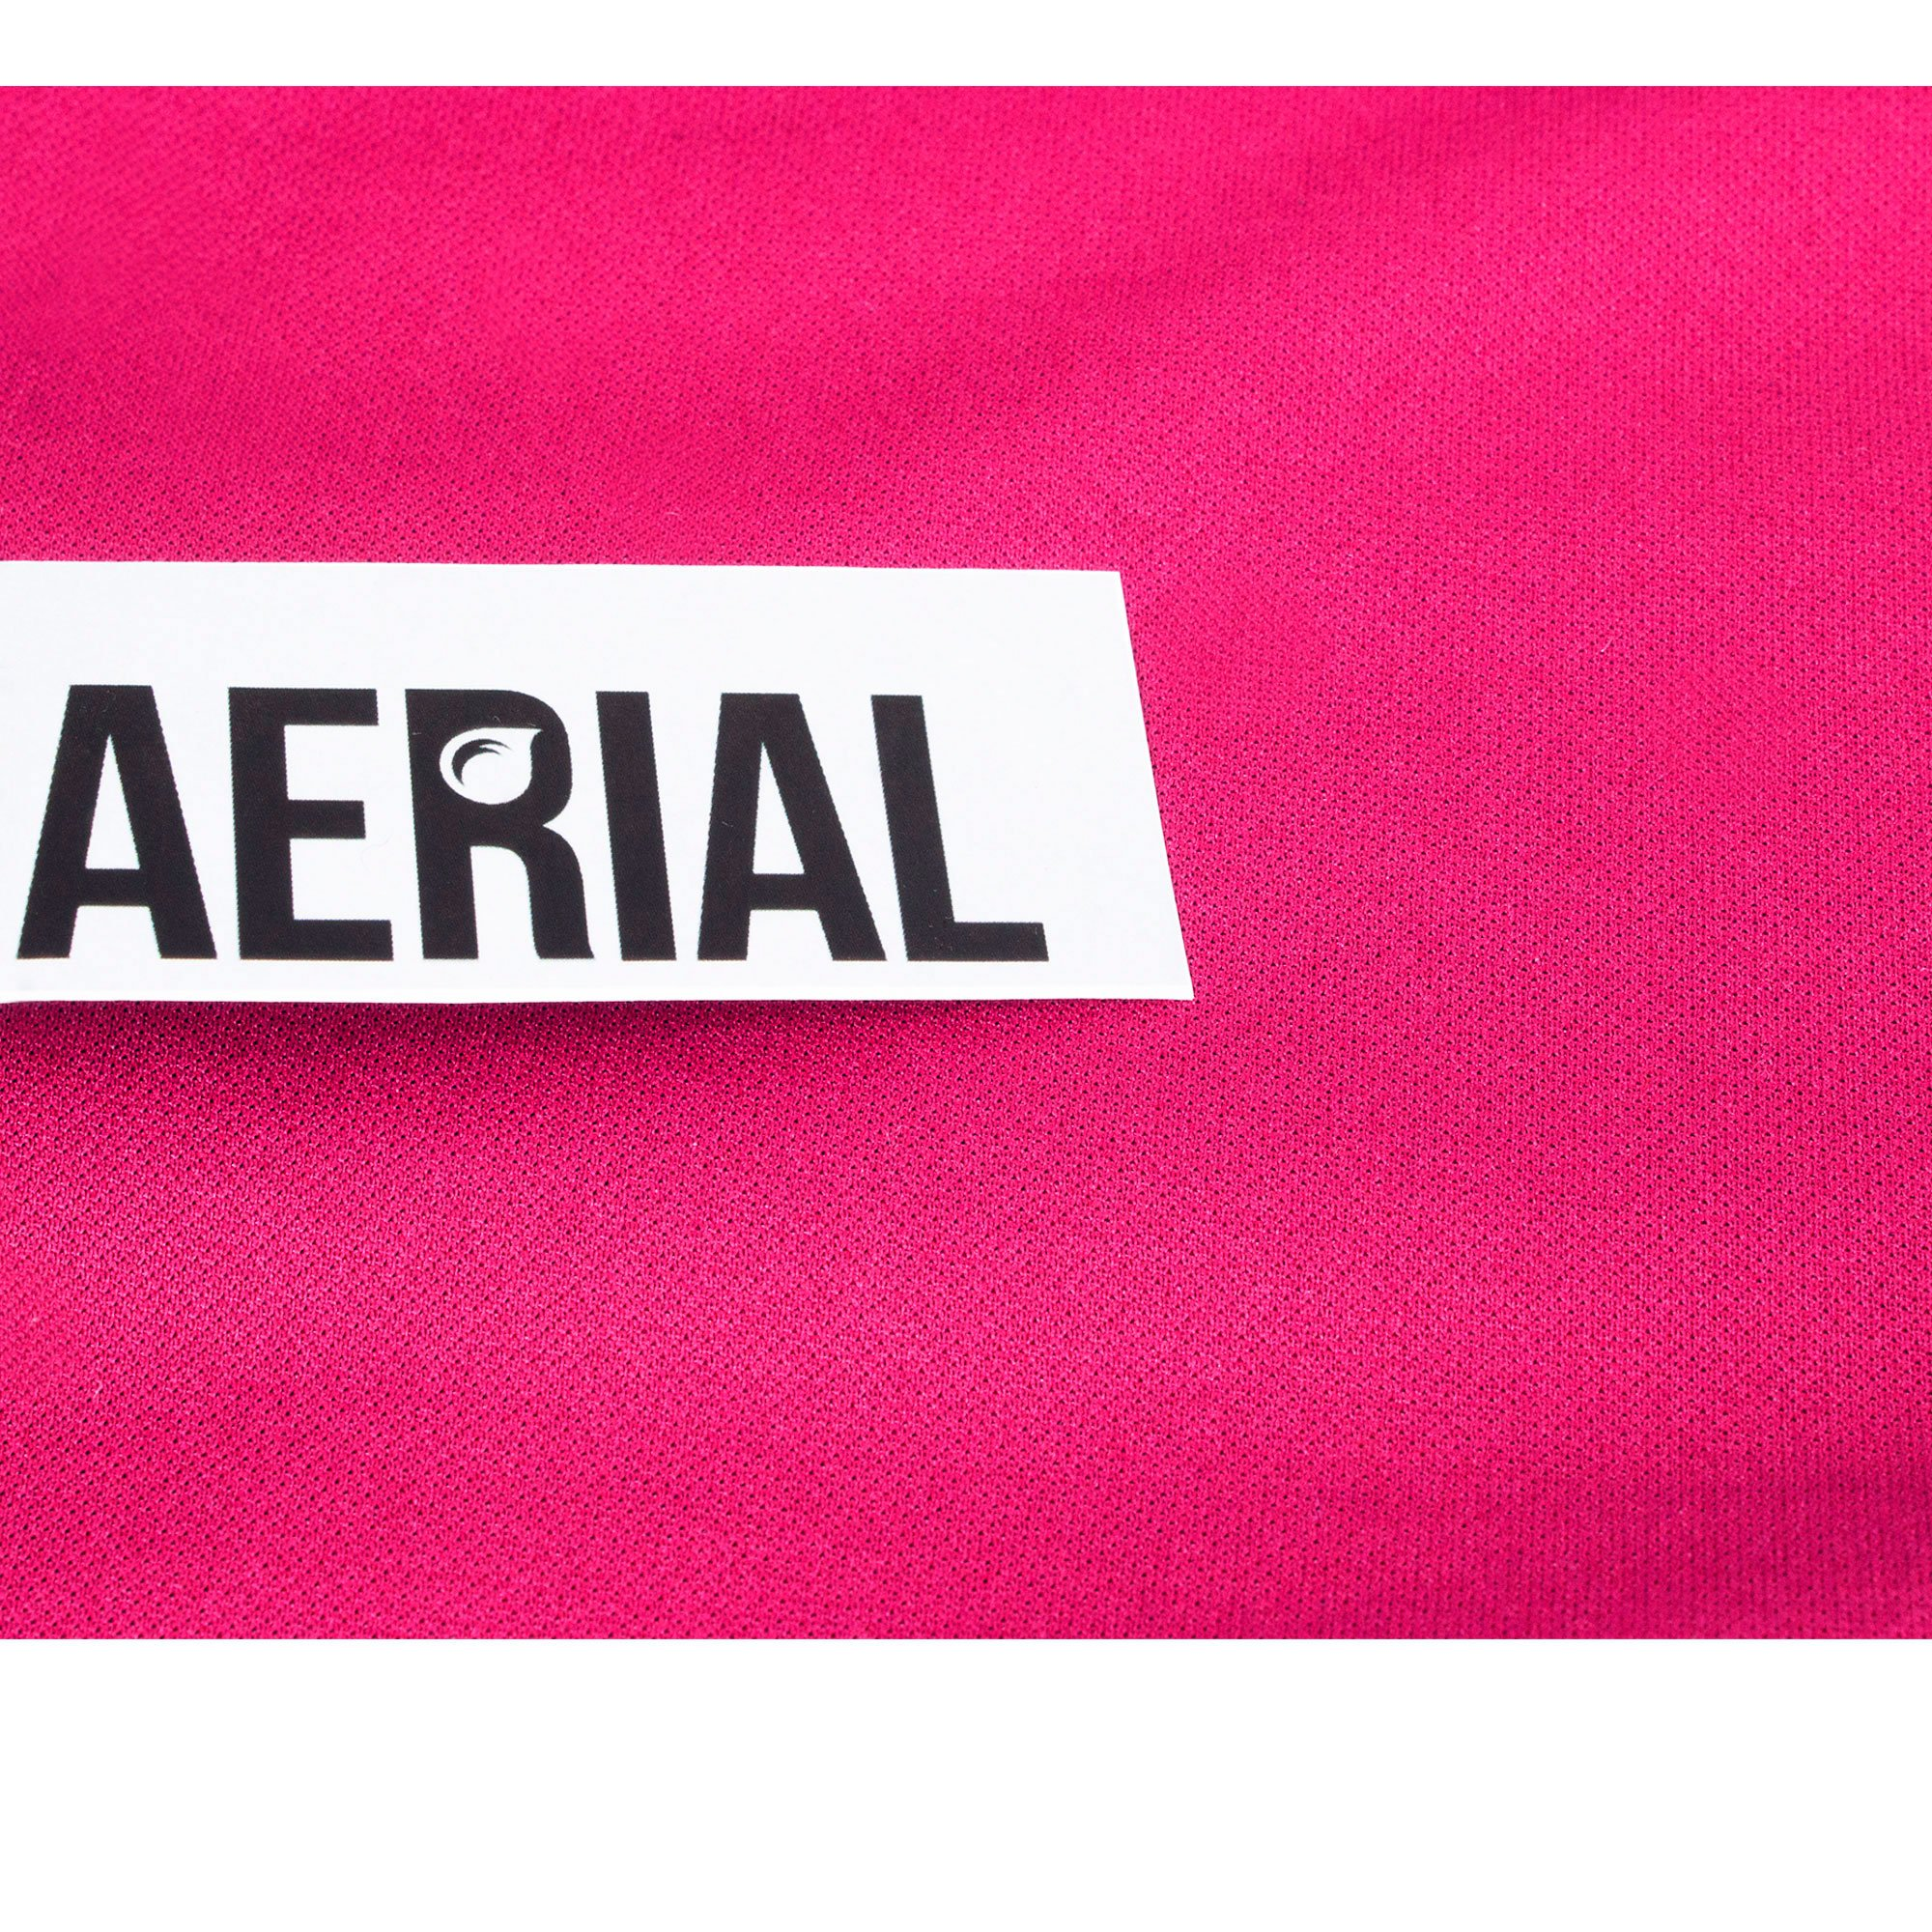 Firetoys Aerial Silk (Aerial Fabric / / Fabric Tissus) - Hot Rosa-8 metres aa64e6